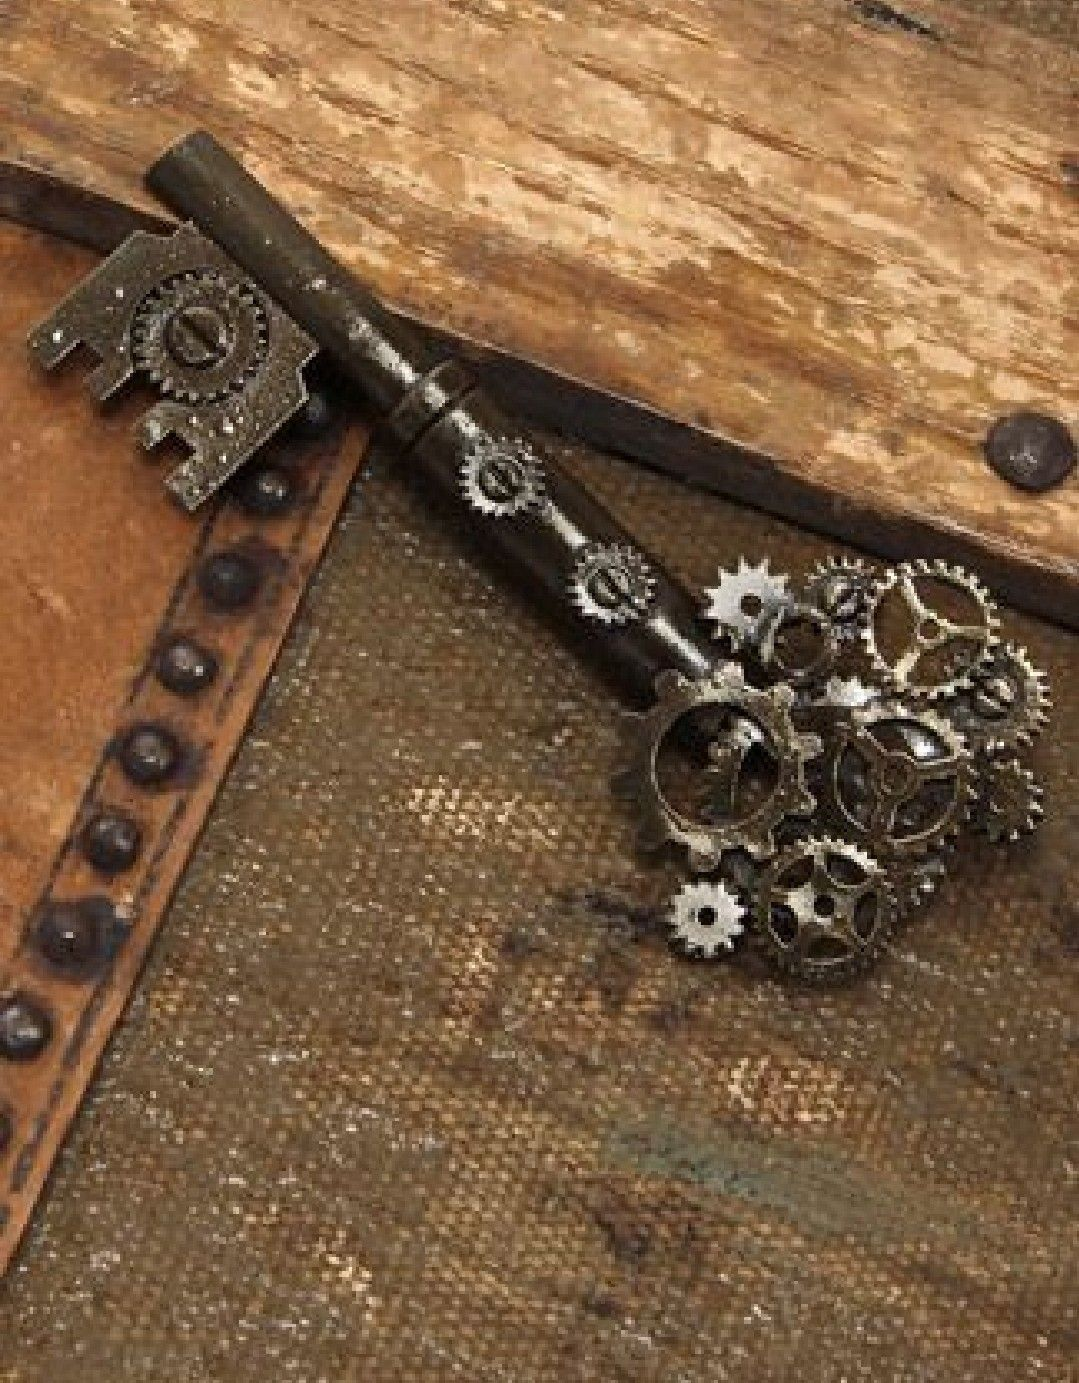 Blade bow antique keys key jewelry vintage keys